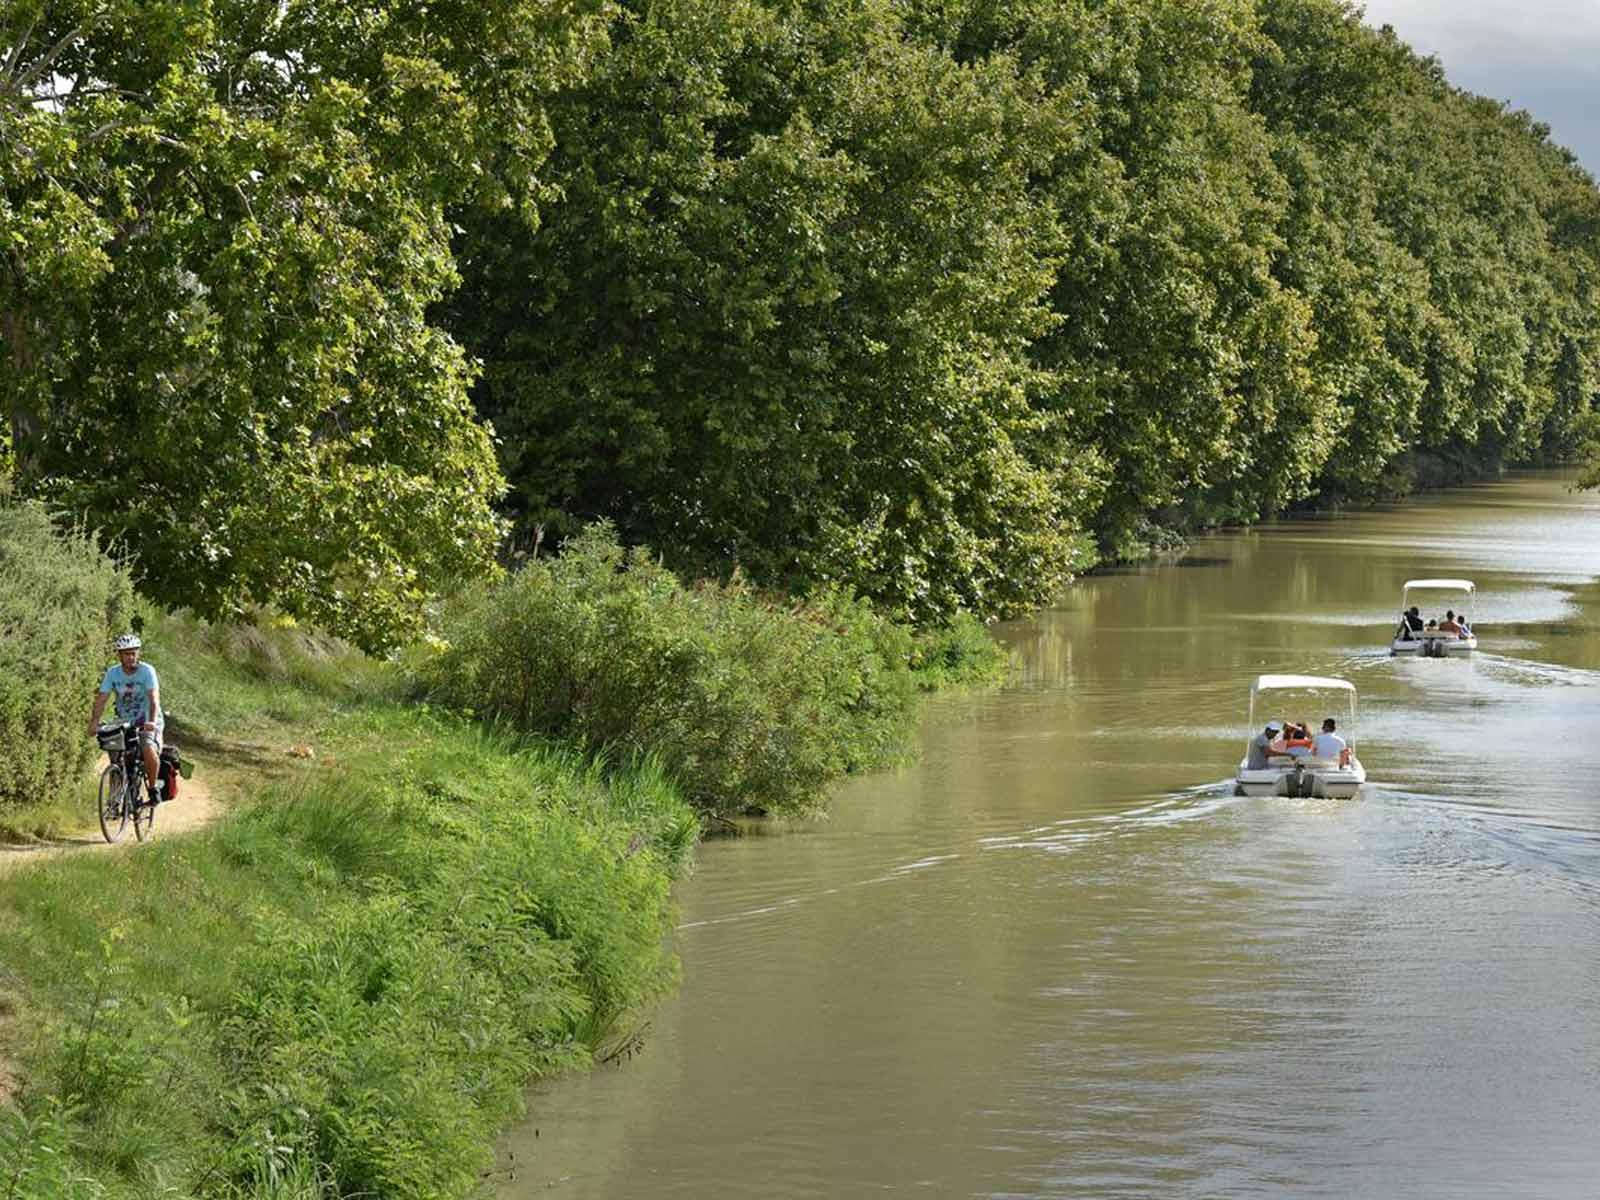 balade vélo et location bateau canal du midi